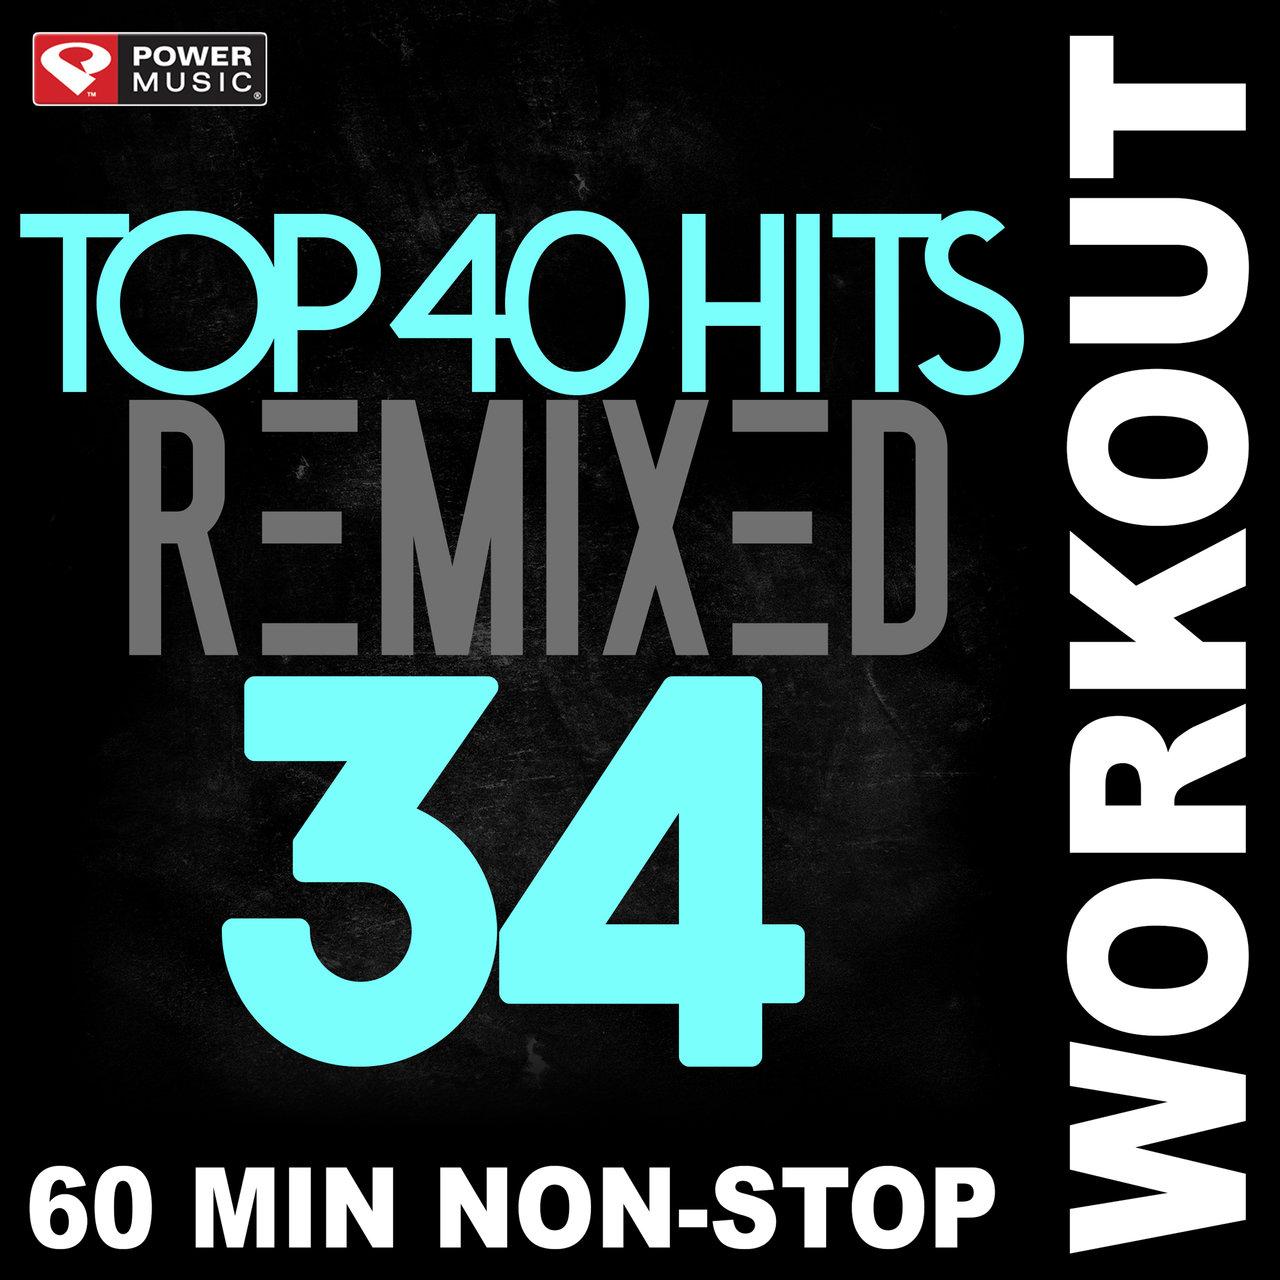 Top 40 songs 140 bpm